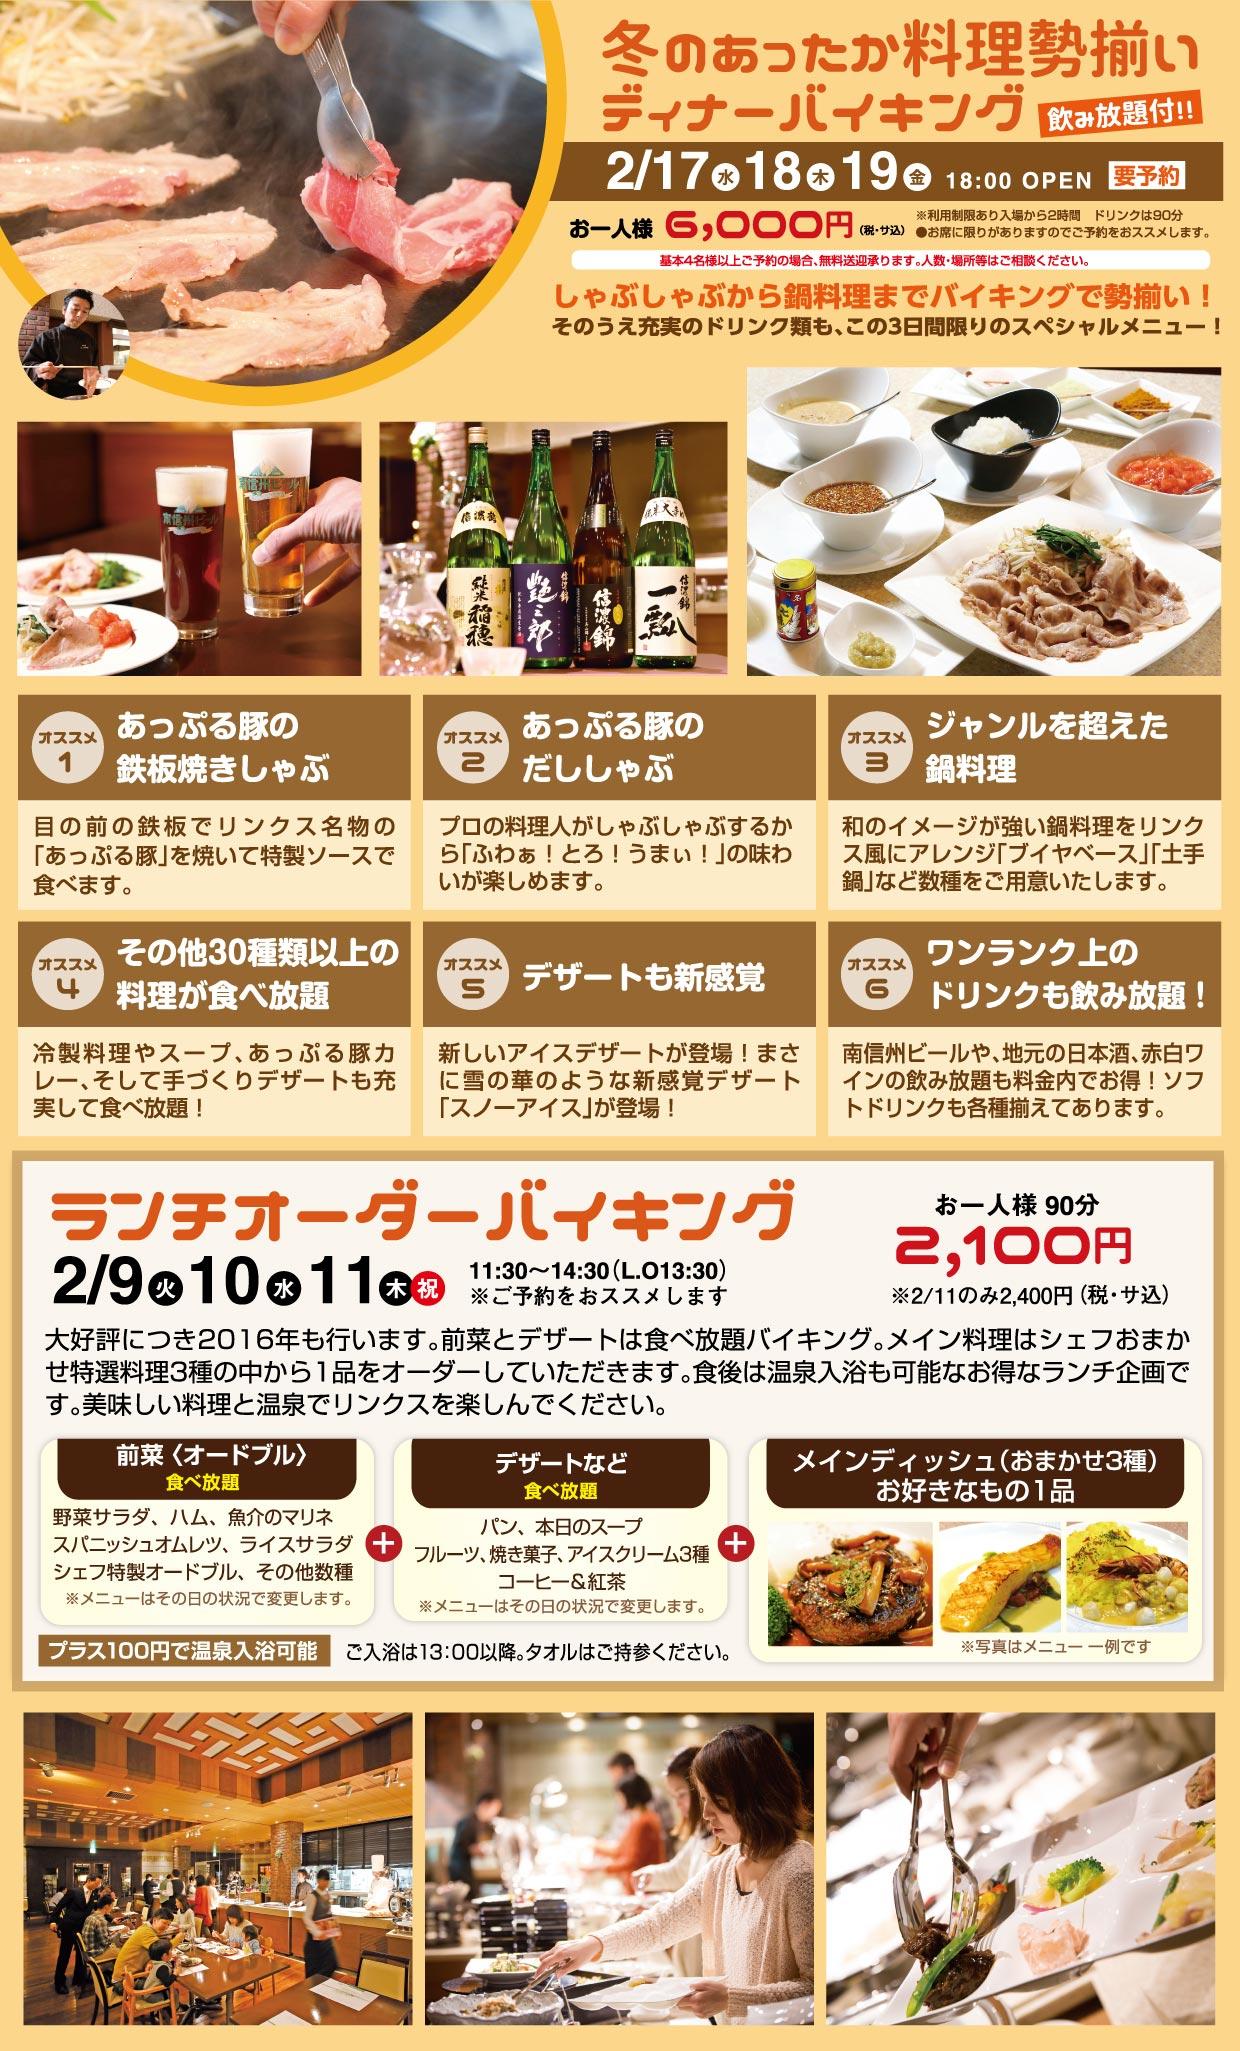 http://www.komagane-linx.co.jp/blogimages/20160201-ado.jpg